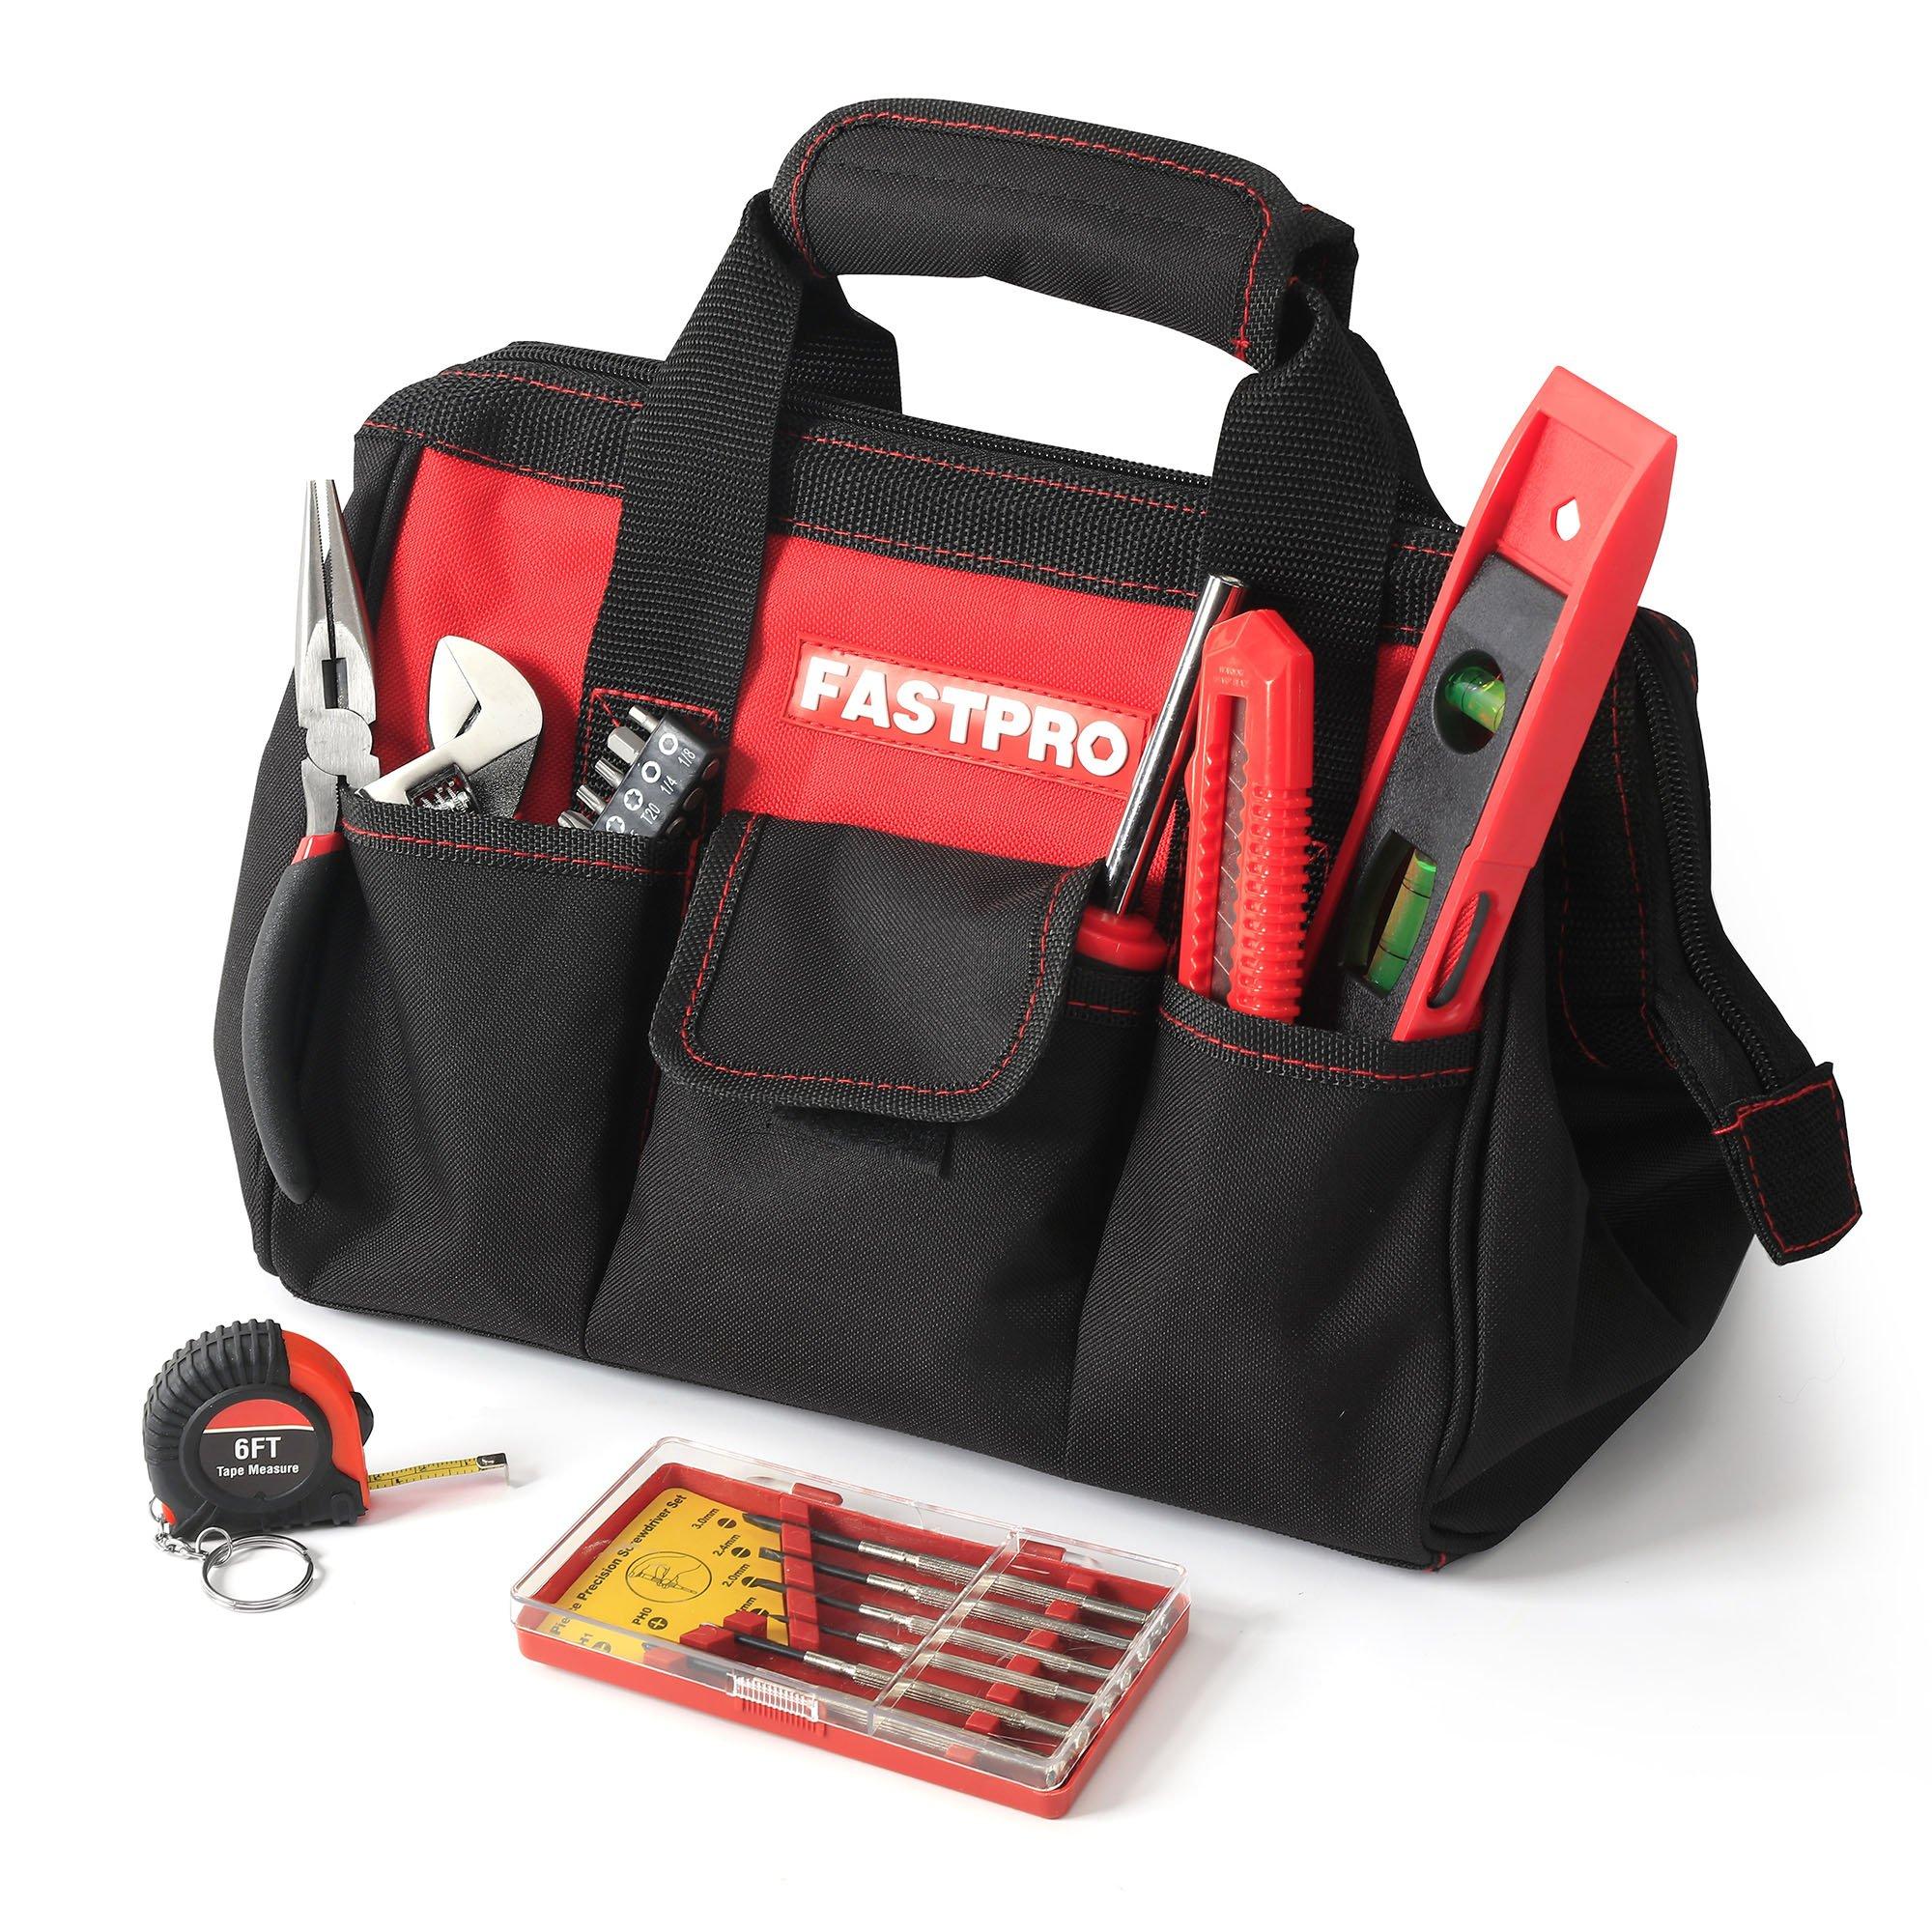 FASTPRO 23-piece Basics Tool Set with Tool Bag by FASTPRO (Image #3)